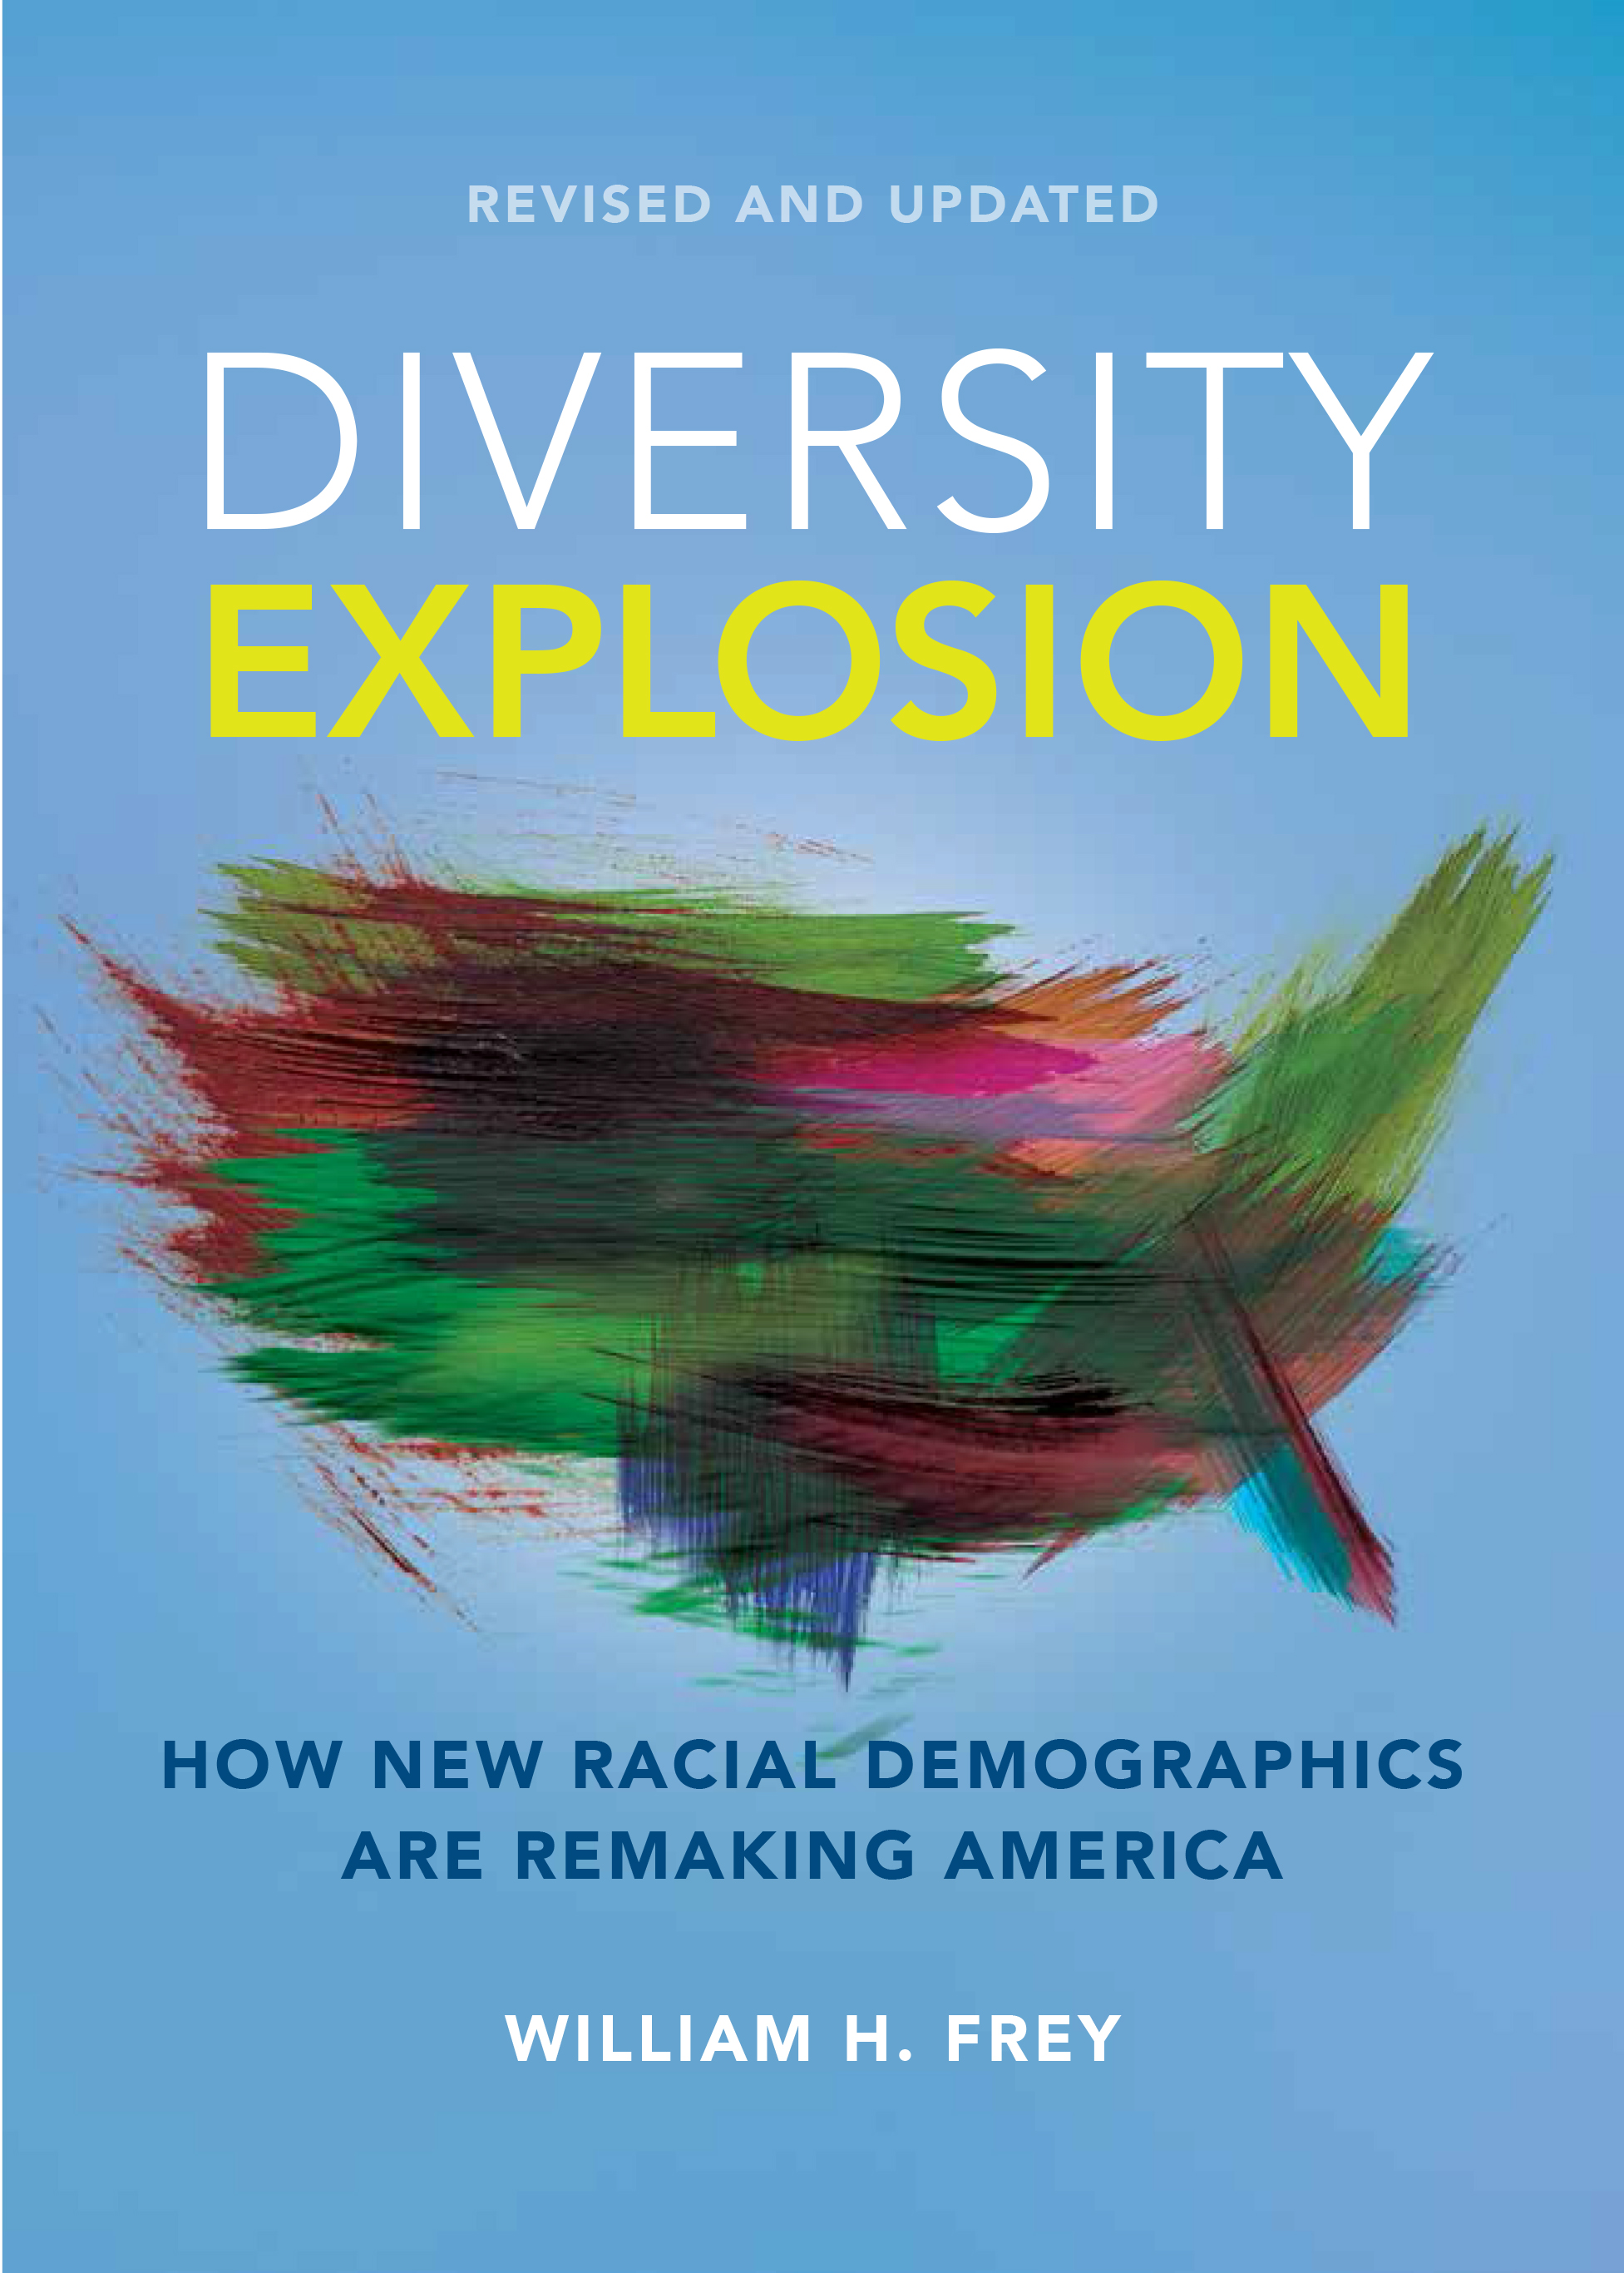 Copy of Book: Diversity Explosion